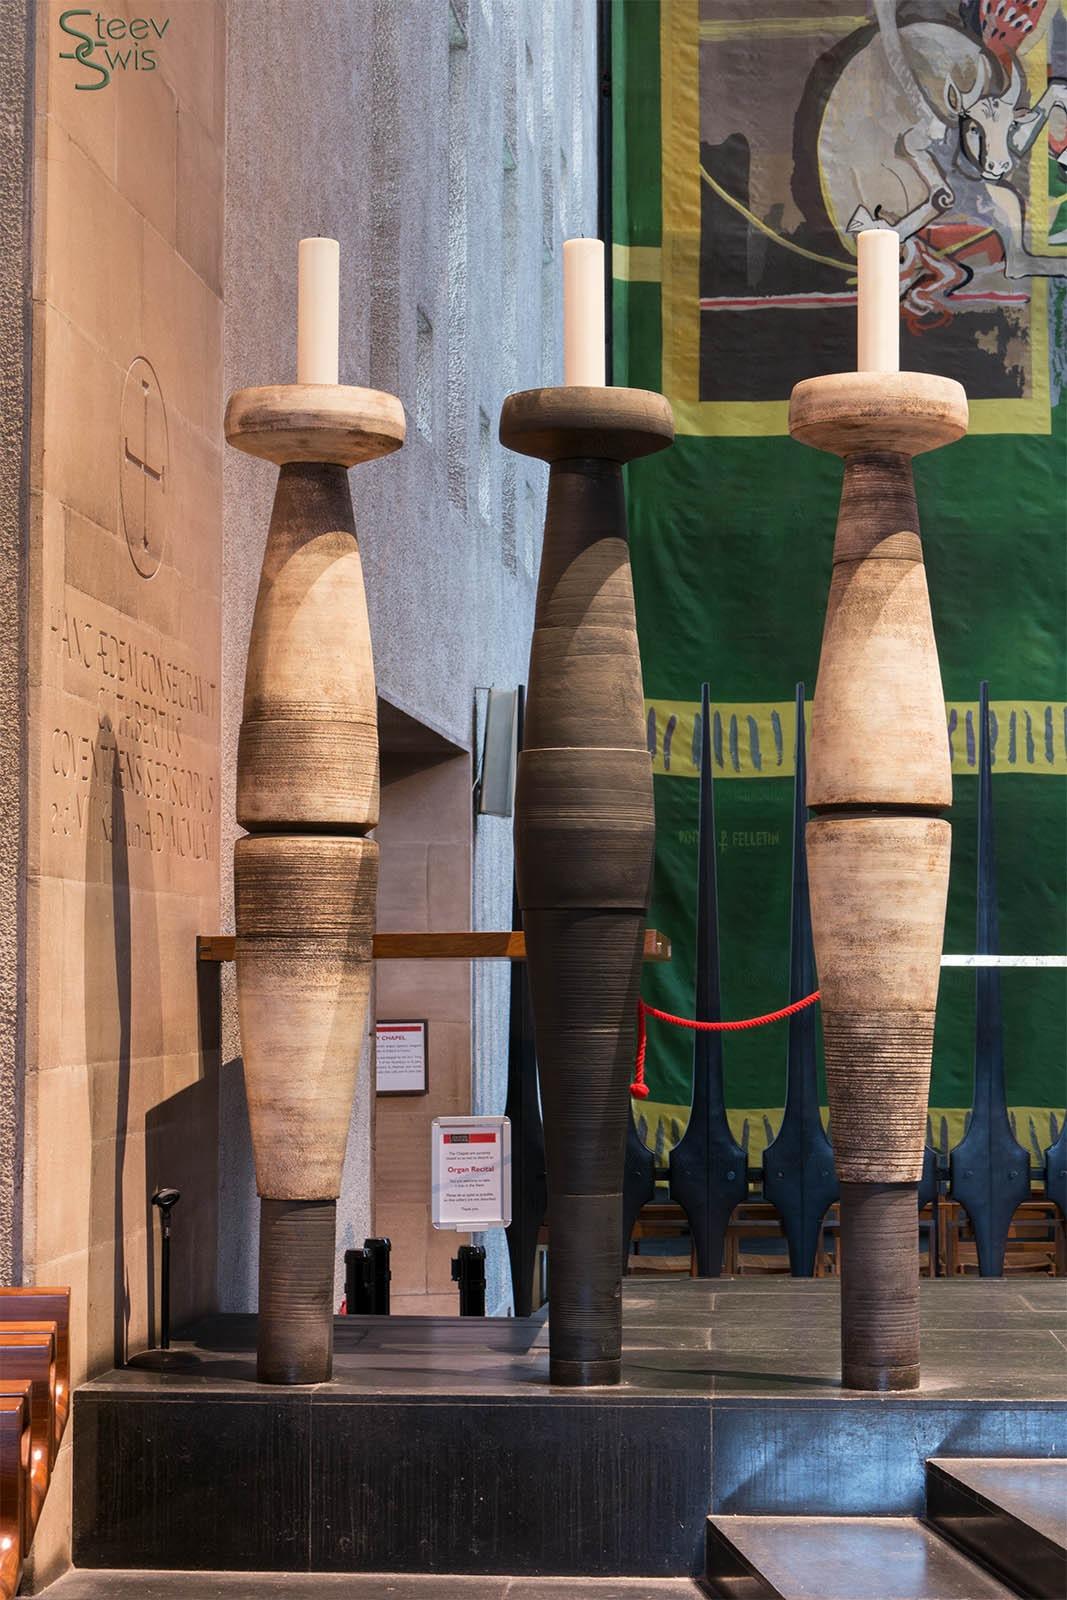 huge candlesticks by Steve Swis